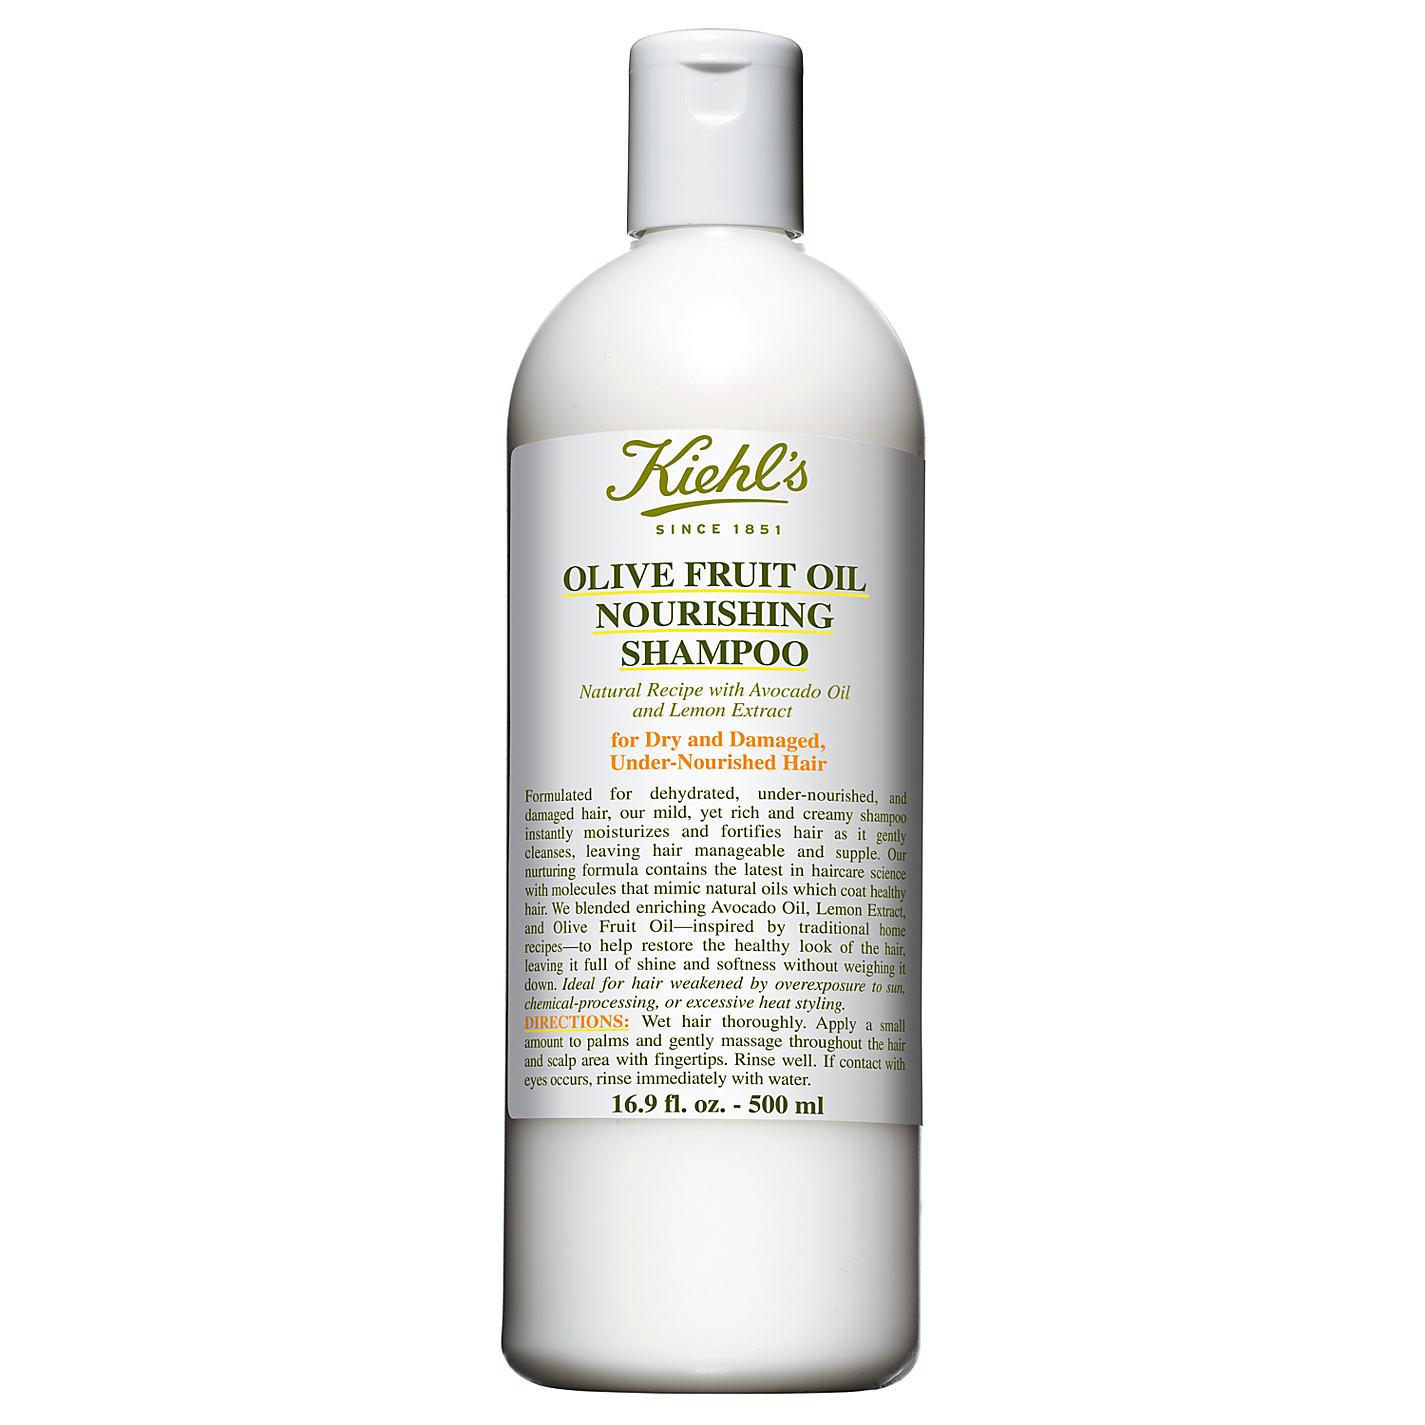 Kiehl's Olive Fruit Oil Nourishing